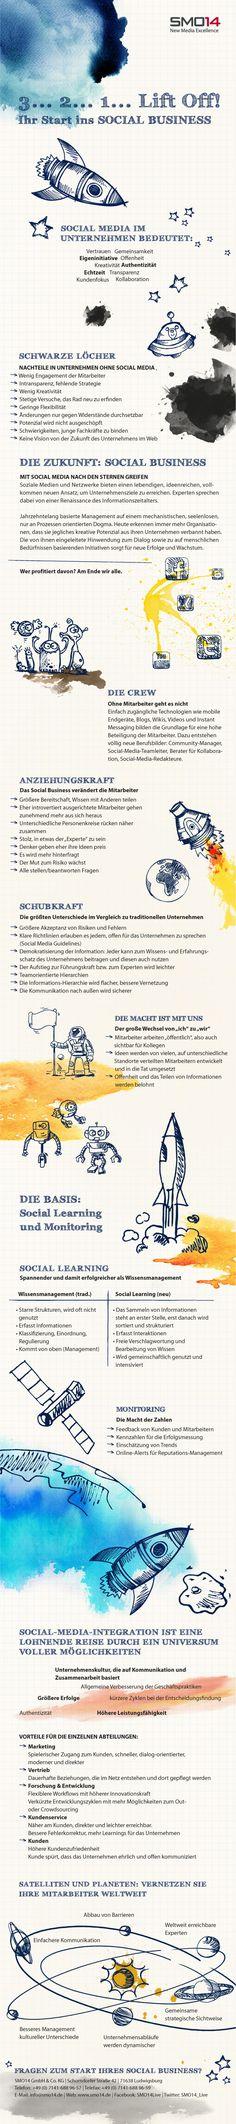 Ihr Start ins Social Business 2012 (via www.smo14.de) #socbiz